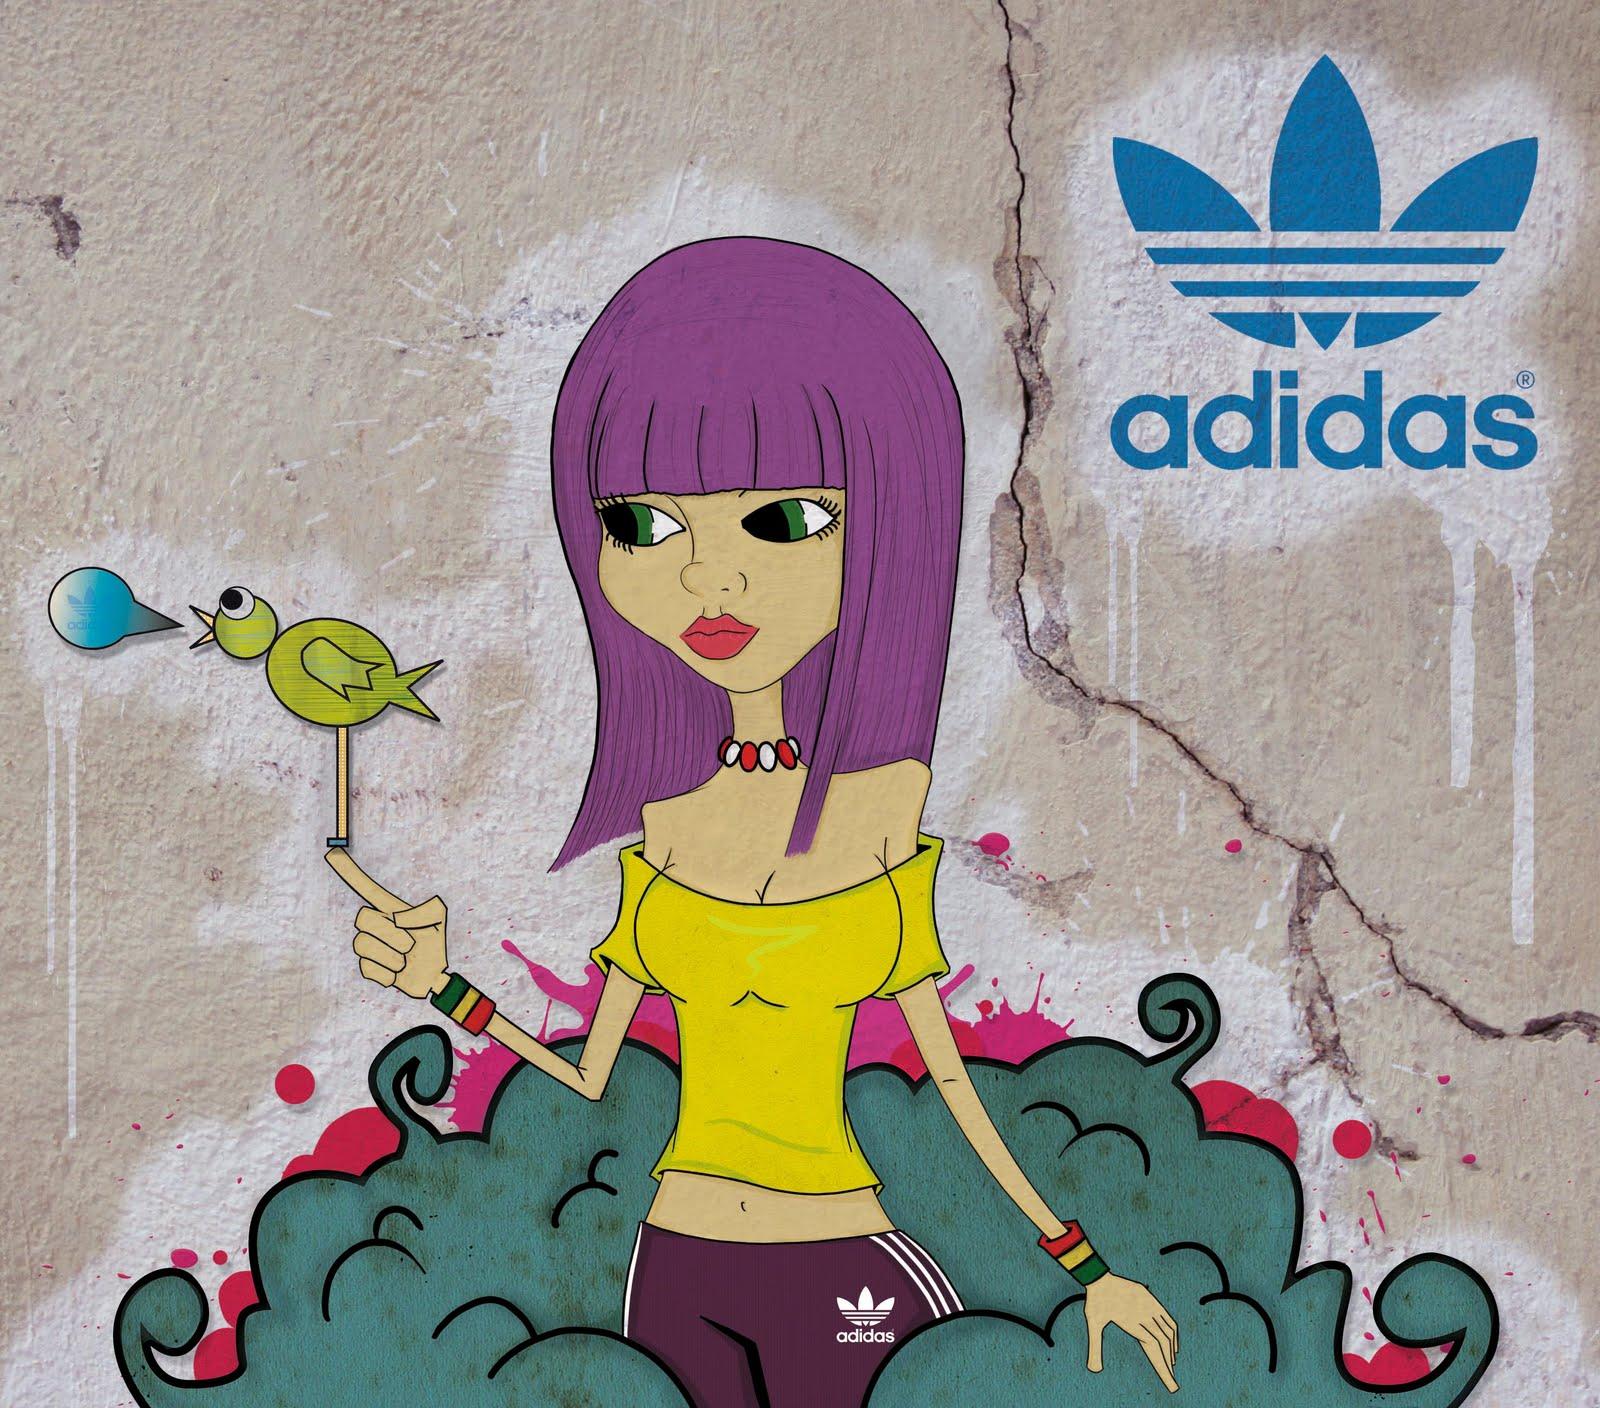 http://4.bp.blogspot.com/_Mtwg7i-h2uQ/TCqHgKOvDYI/AAAAAAAAAXk/LqTSnOwrpno/s1600/muro++adidas+2.jpg